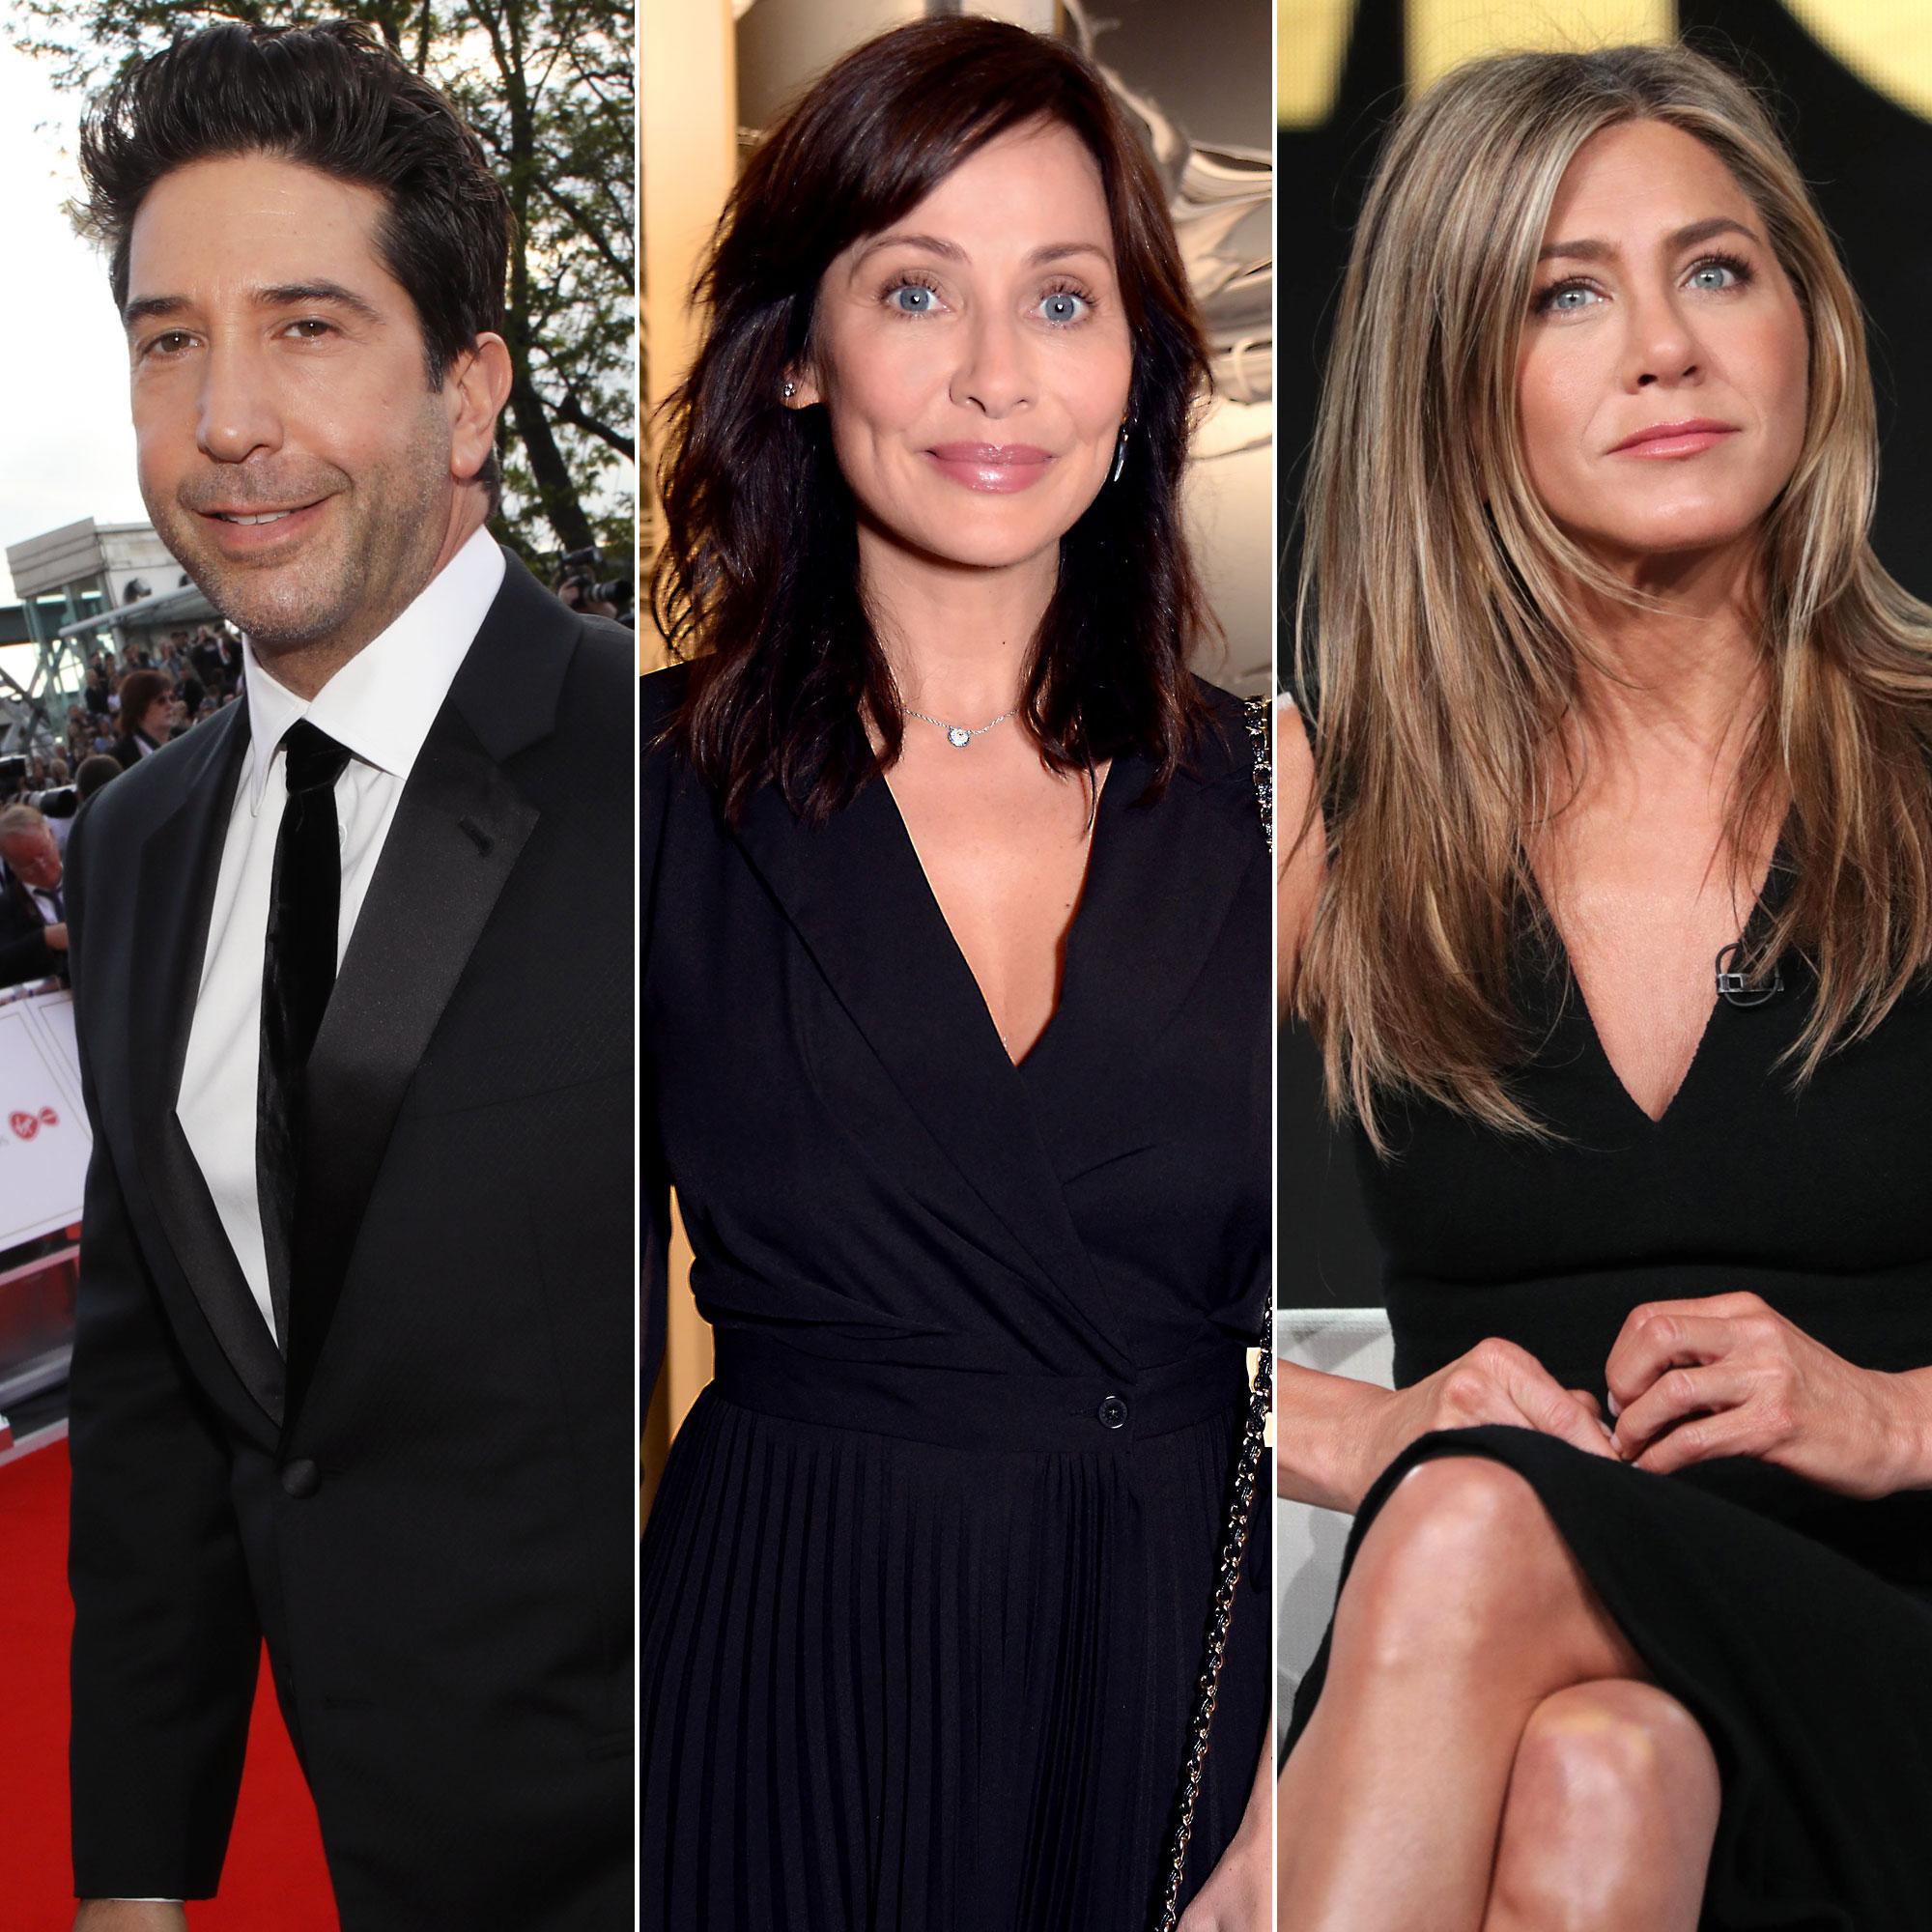 David Schwimmer's Ex Natalie Imbruglia Reacts to His Jennifer Aniston 'Crush'